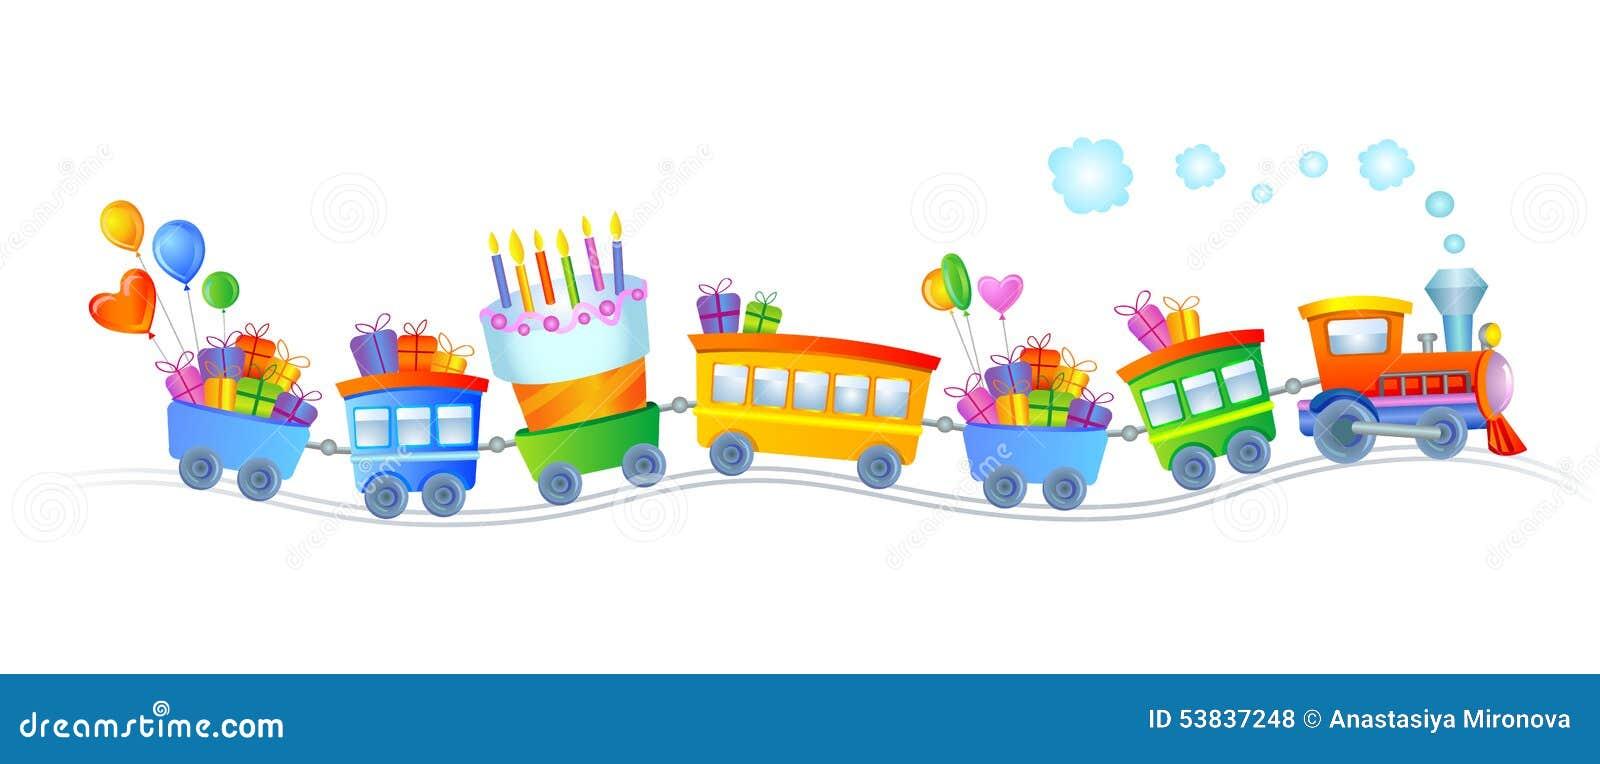 Trem do feliz aniversario